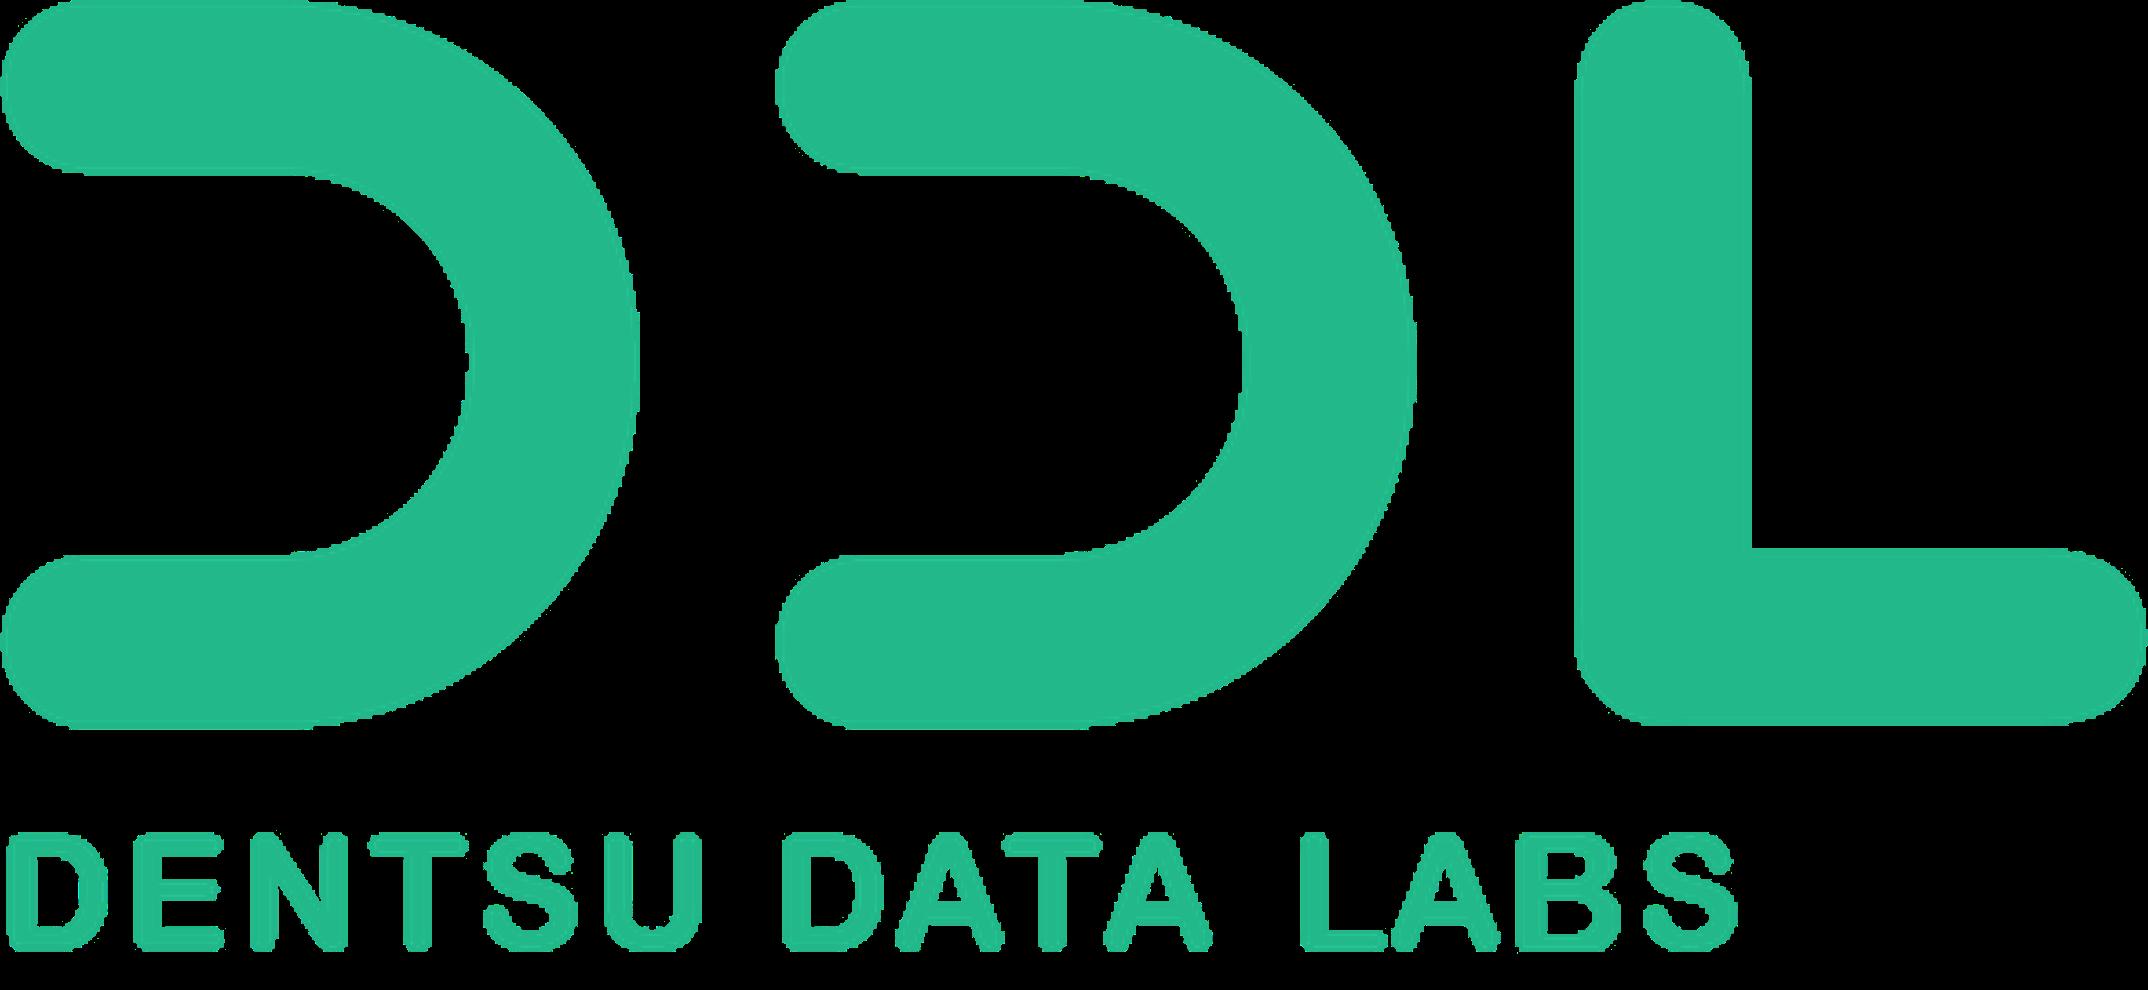 Dentsu Data Labs